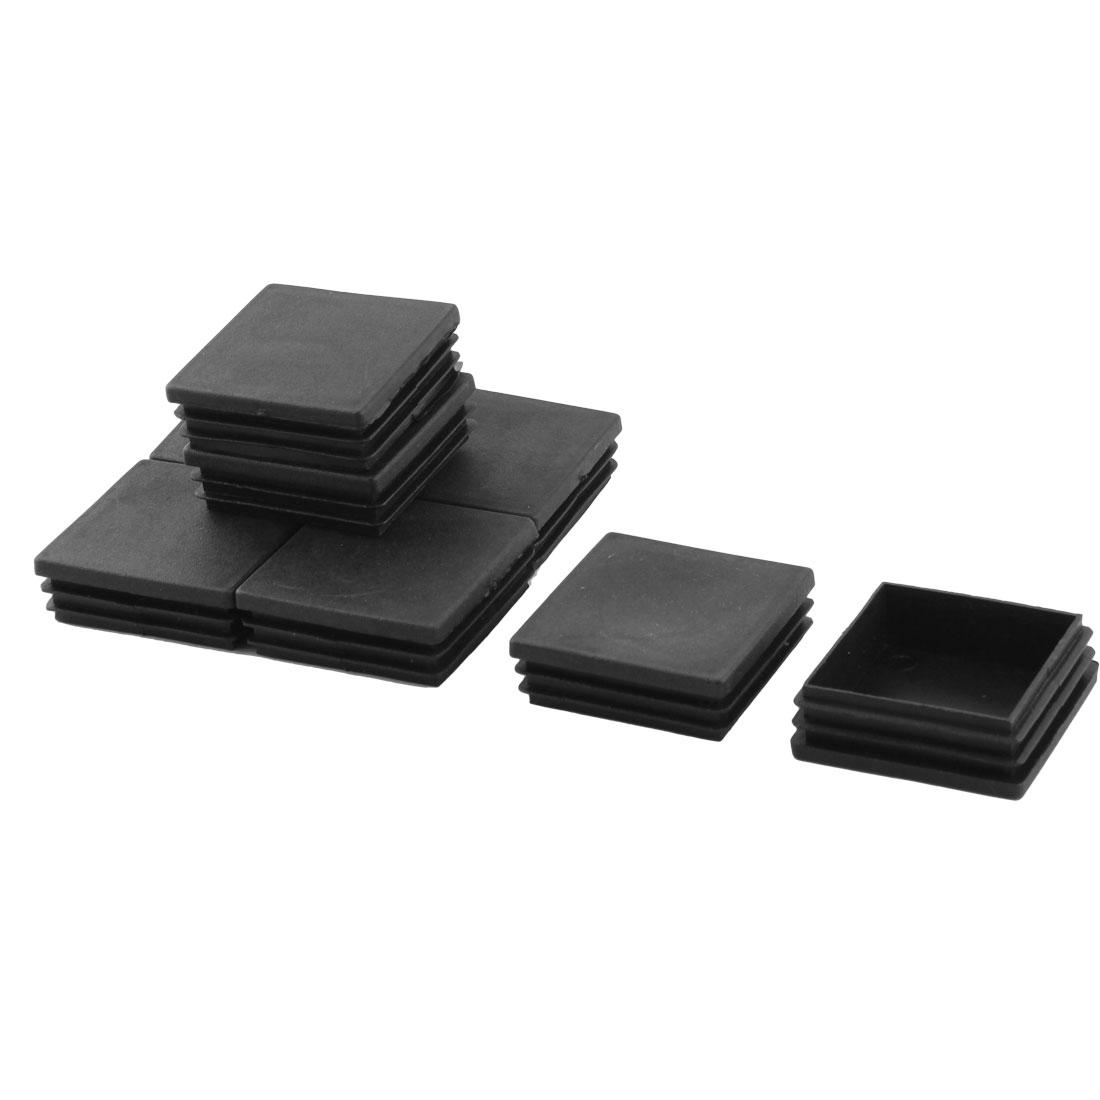 Home Office Plastic Square Table Chair Leg Tube Inserts Black 60 x 60mm 8pcs